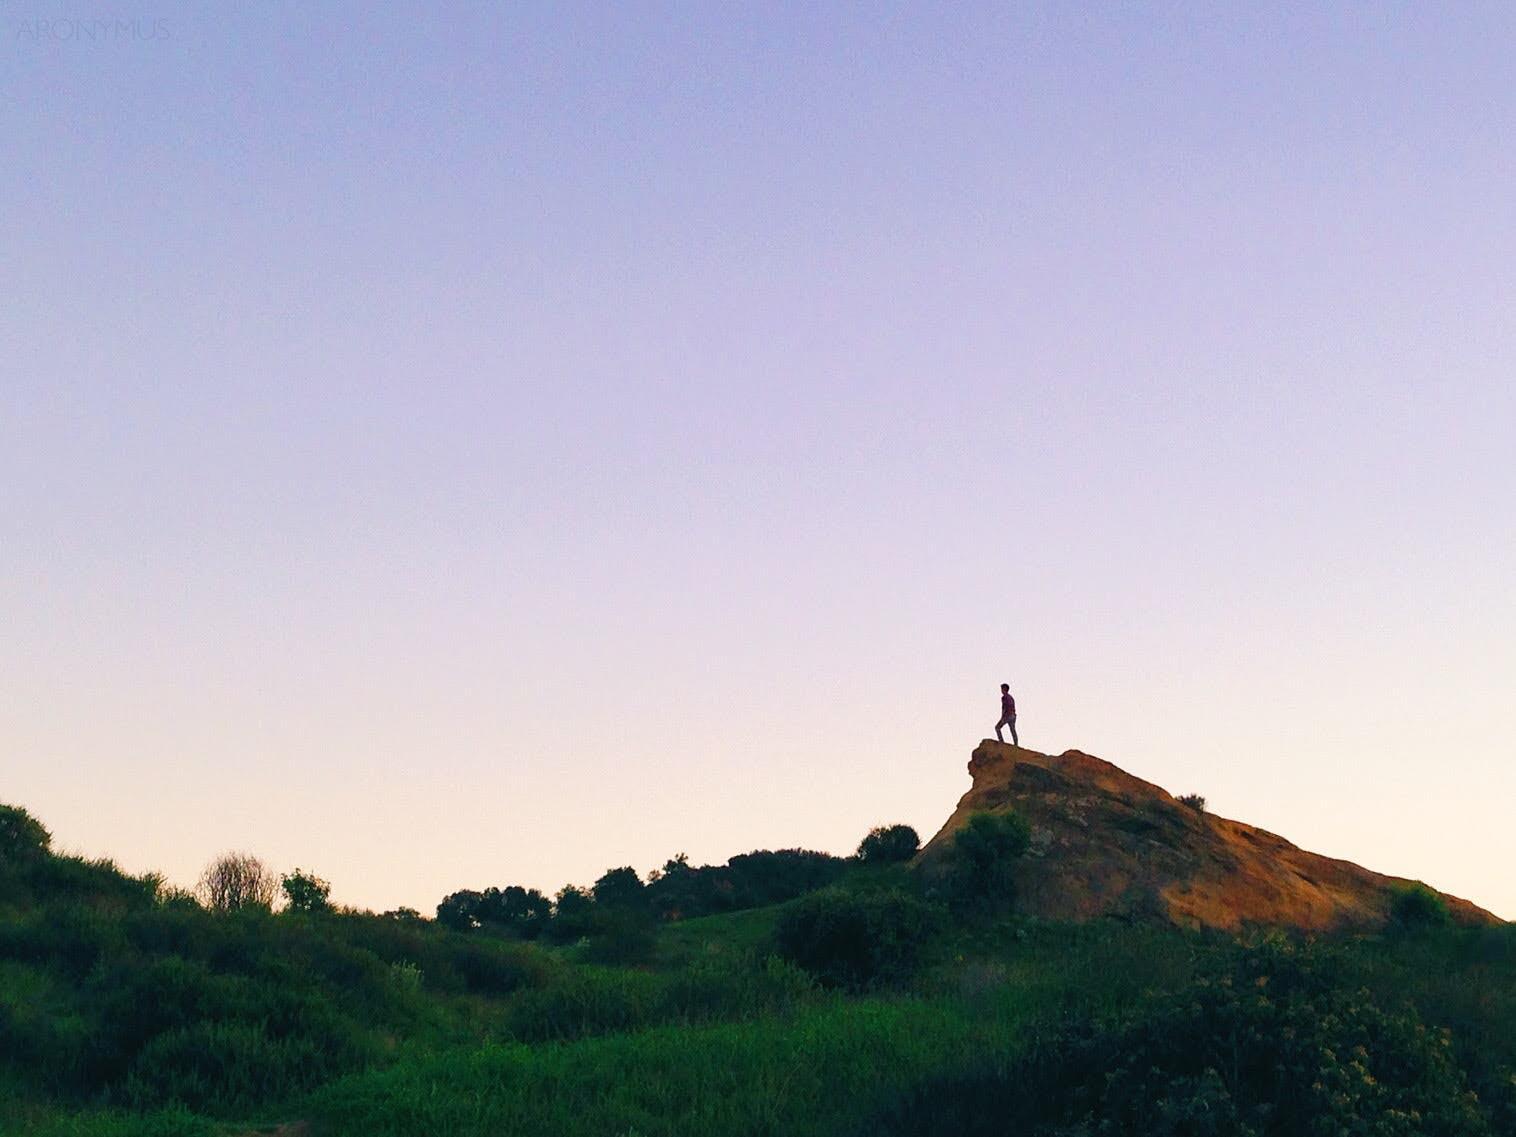 Person on a Brown Rocks Near Green Grass Under Blue Sky Under Daytime